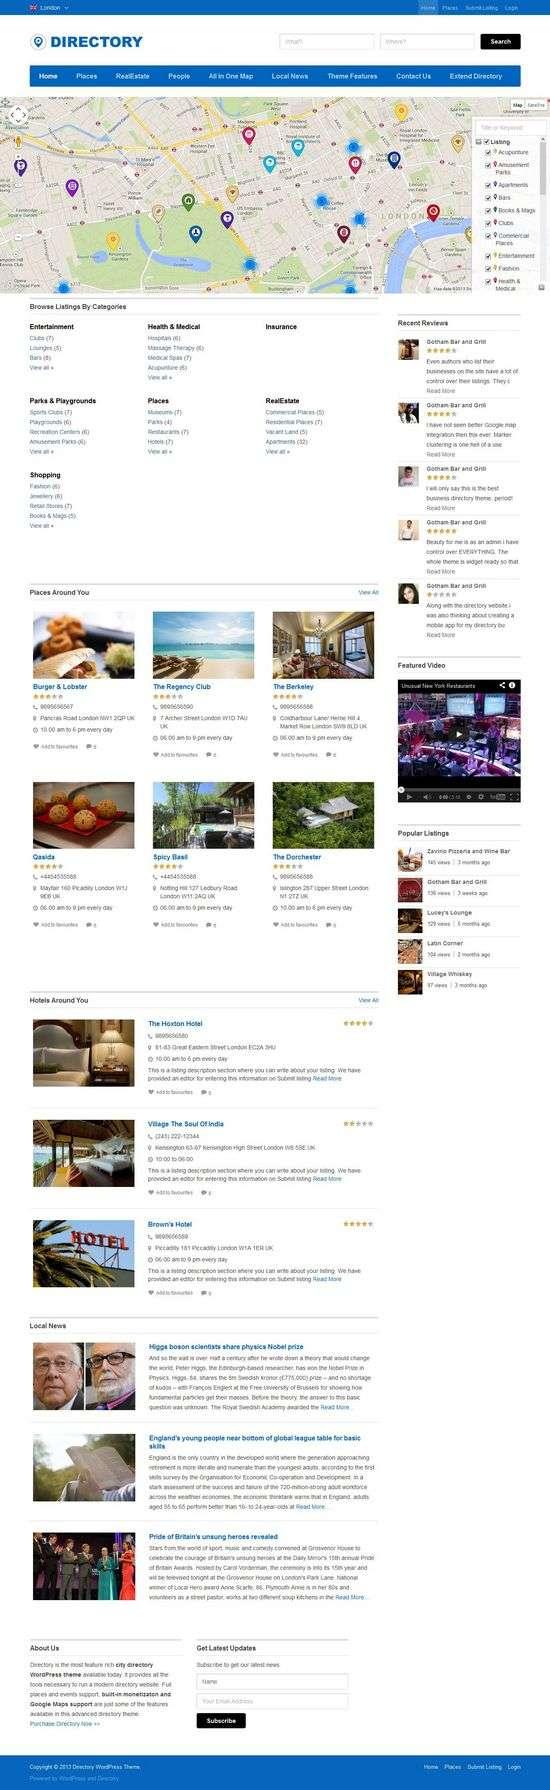 templatic directory avjthemescom 01 - Templatic Directory WordPress Theme